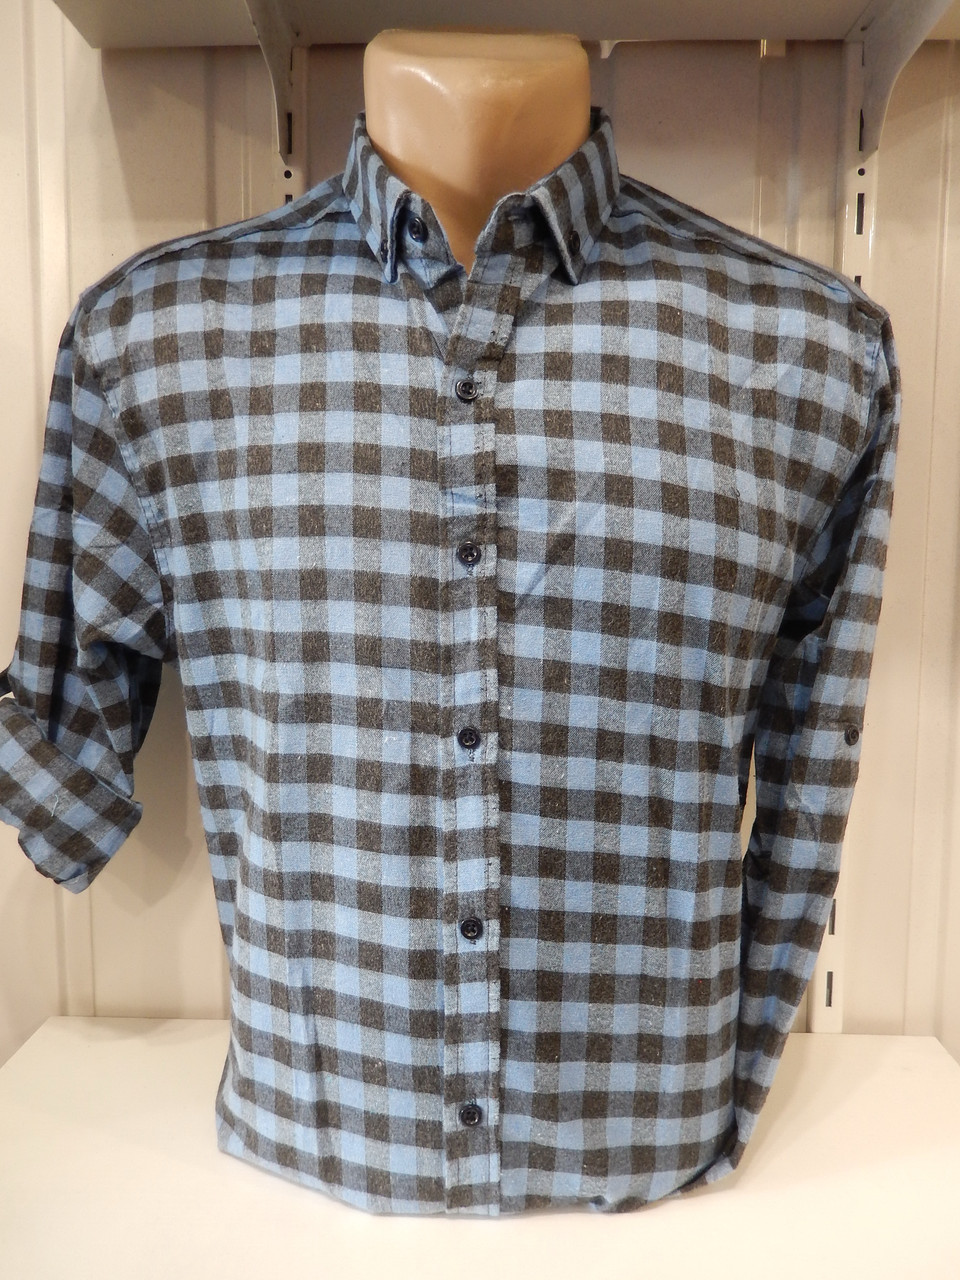 8aaa6453aa2b8a6 Рубашка мужская теплая оптом. Рубашка клетка - Интернет магазин Одежда оптом  в Одессе